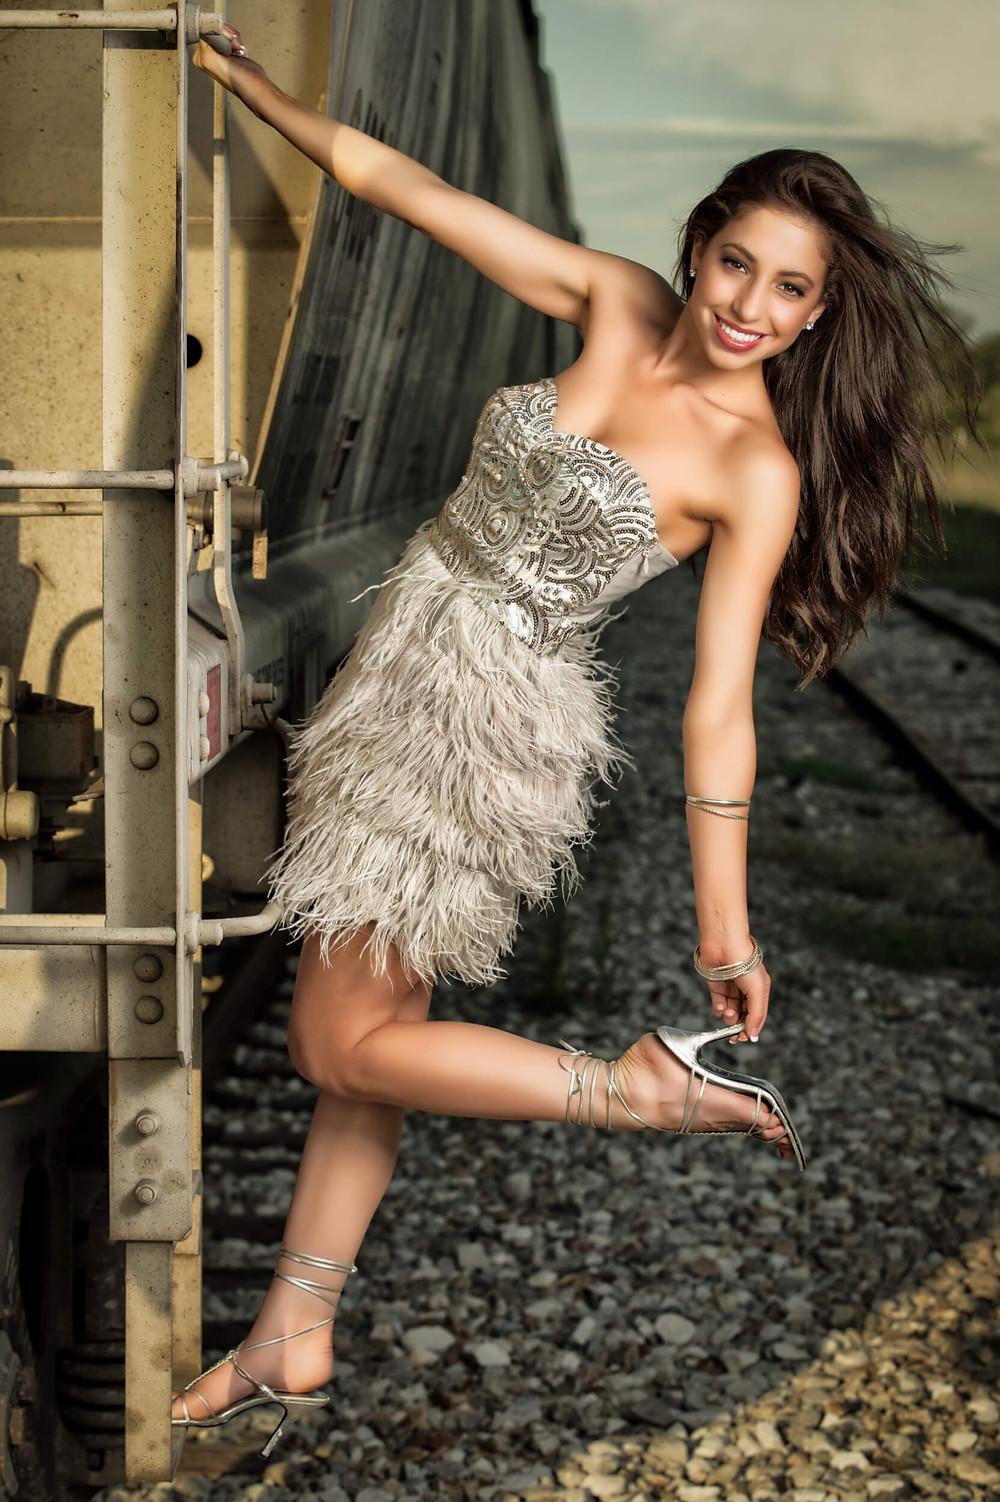 Cher Gopman Miss Clearwater 2013 4